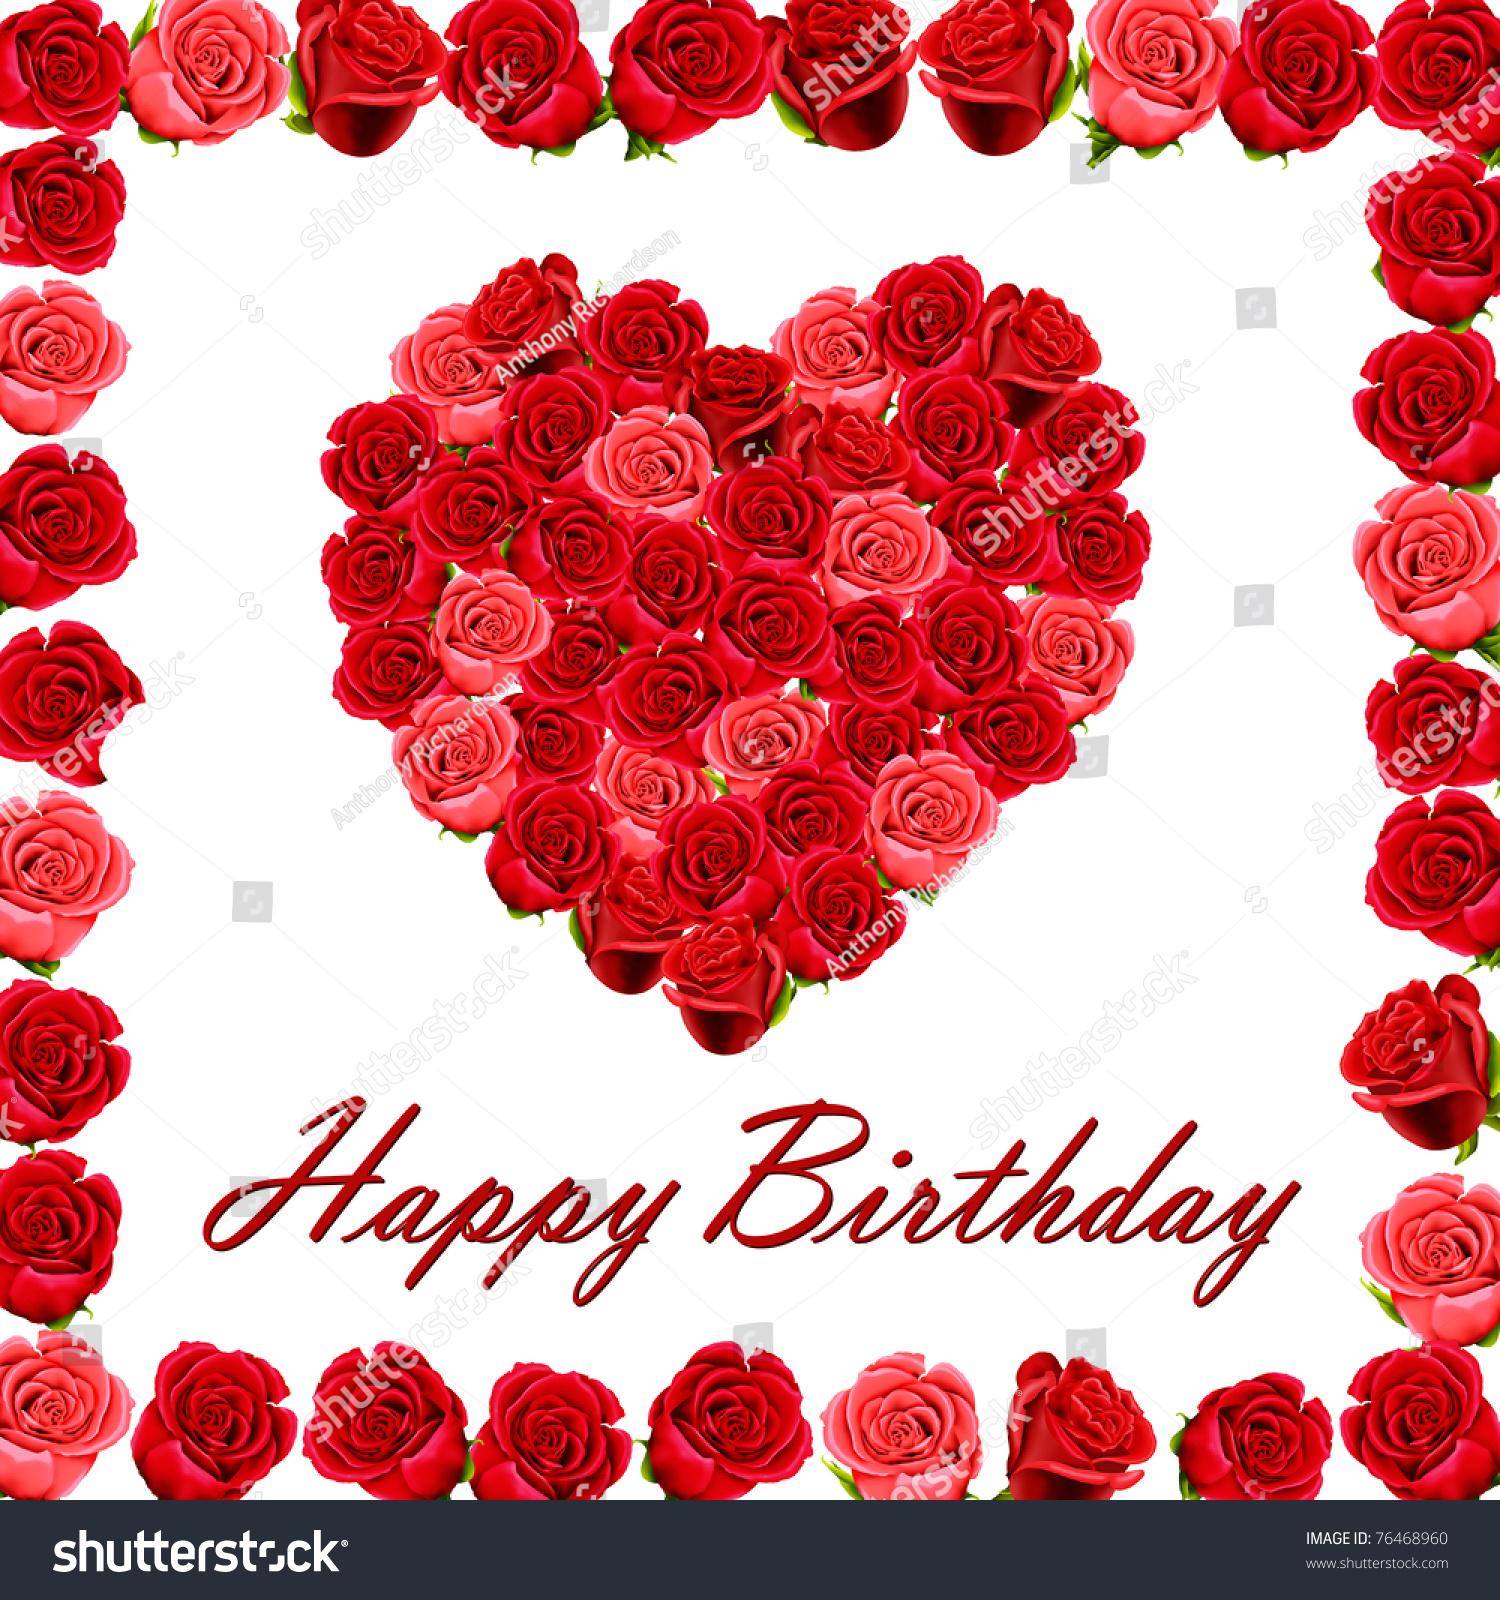 Happy Birthday Heart Roses Roses Border Stock Illustration 76468960